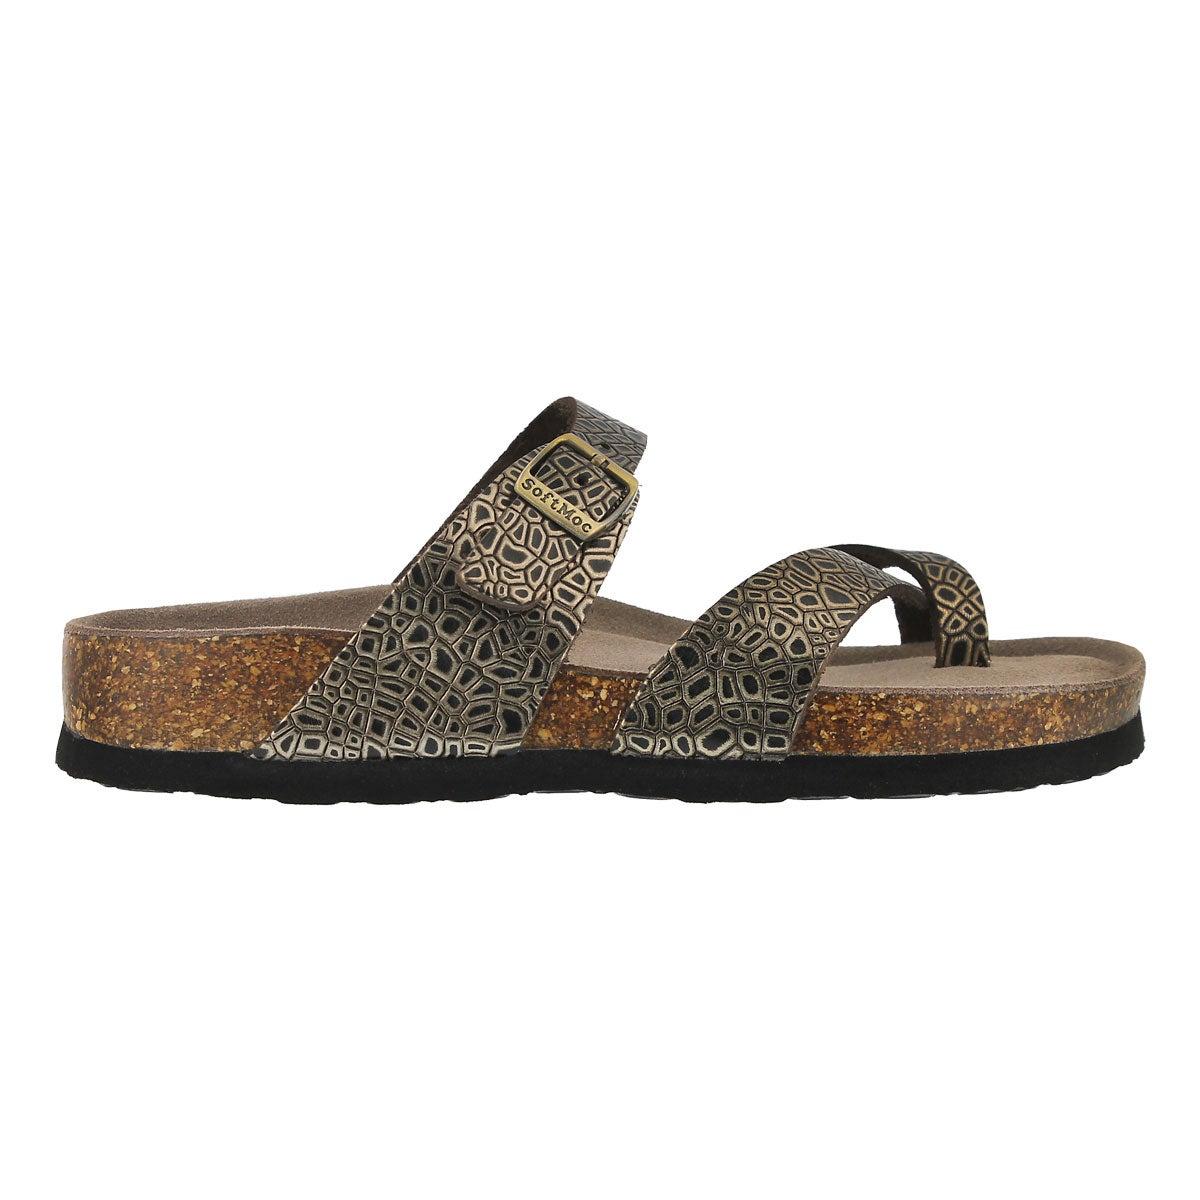 Lds Alicia3 gold snk memory foam sandal